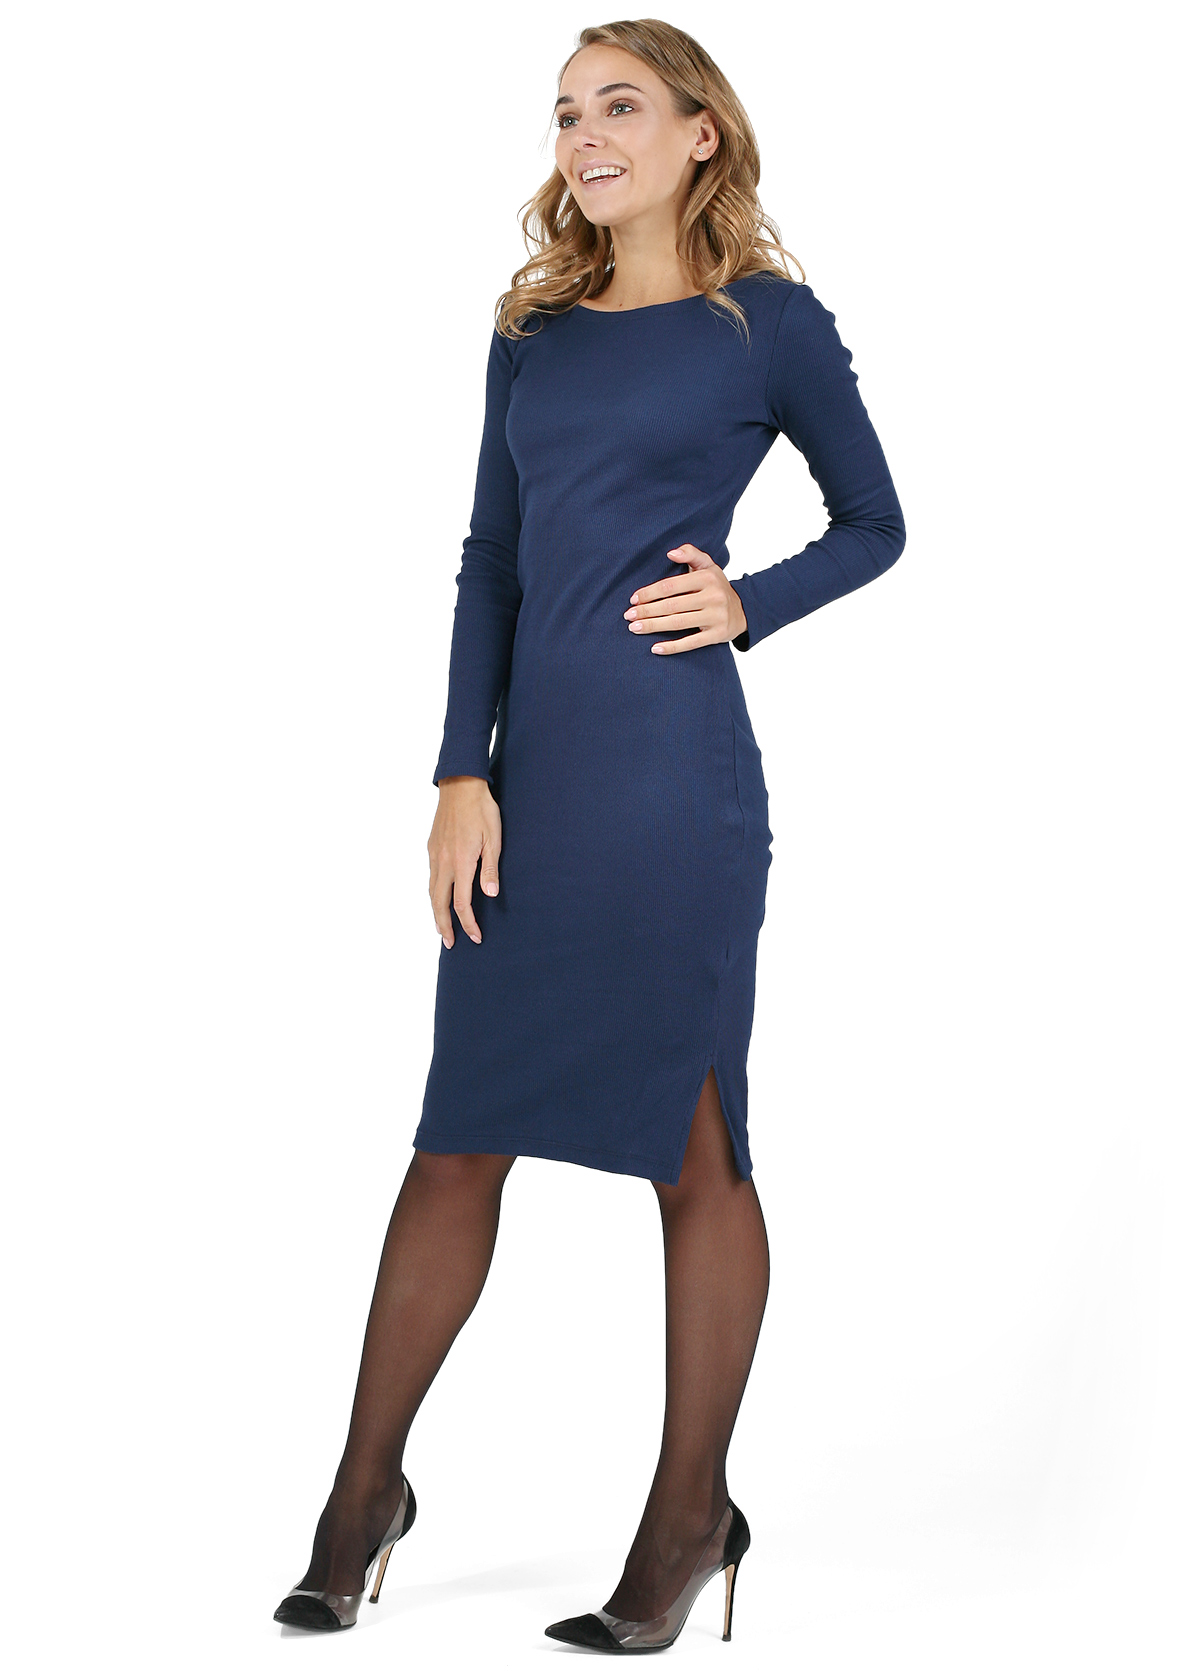 Uralmama santa dark blue picture of santa maternity dress ombrellifo Choice Image